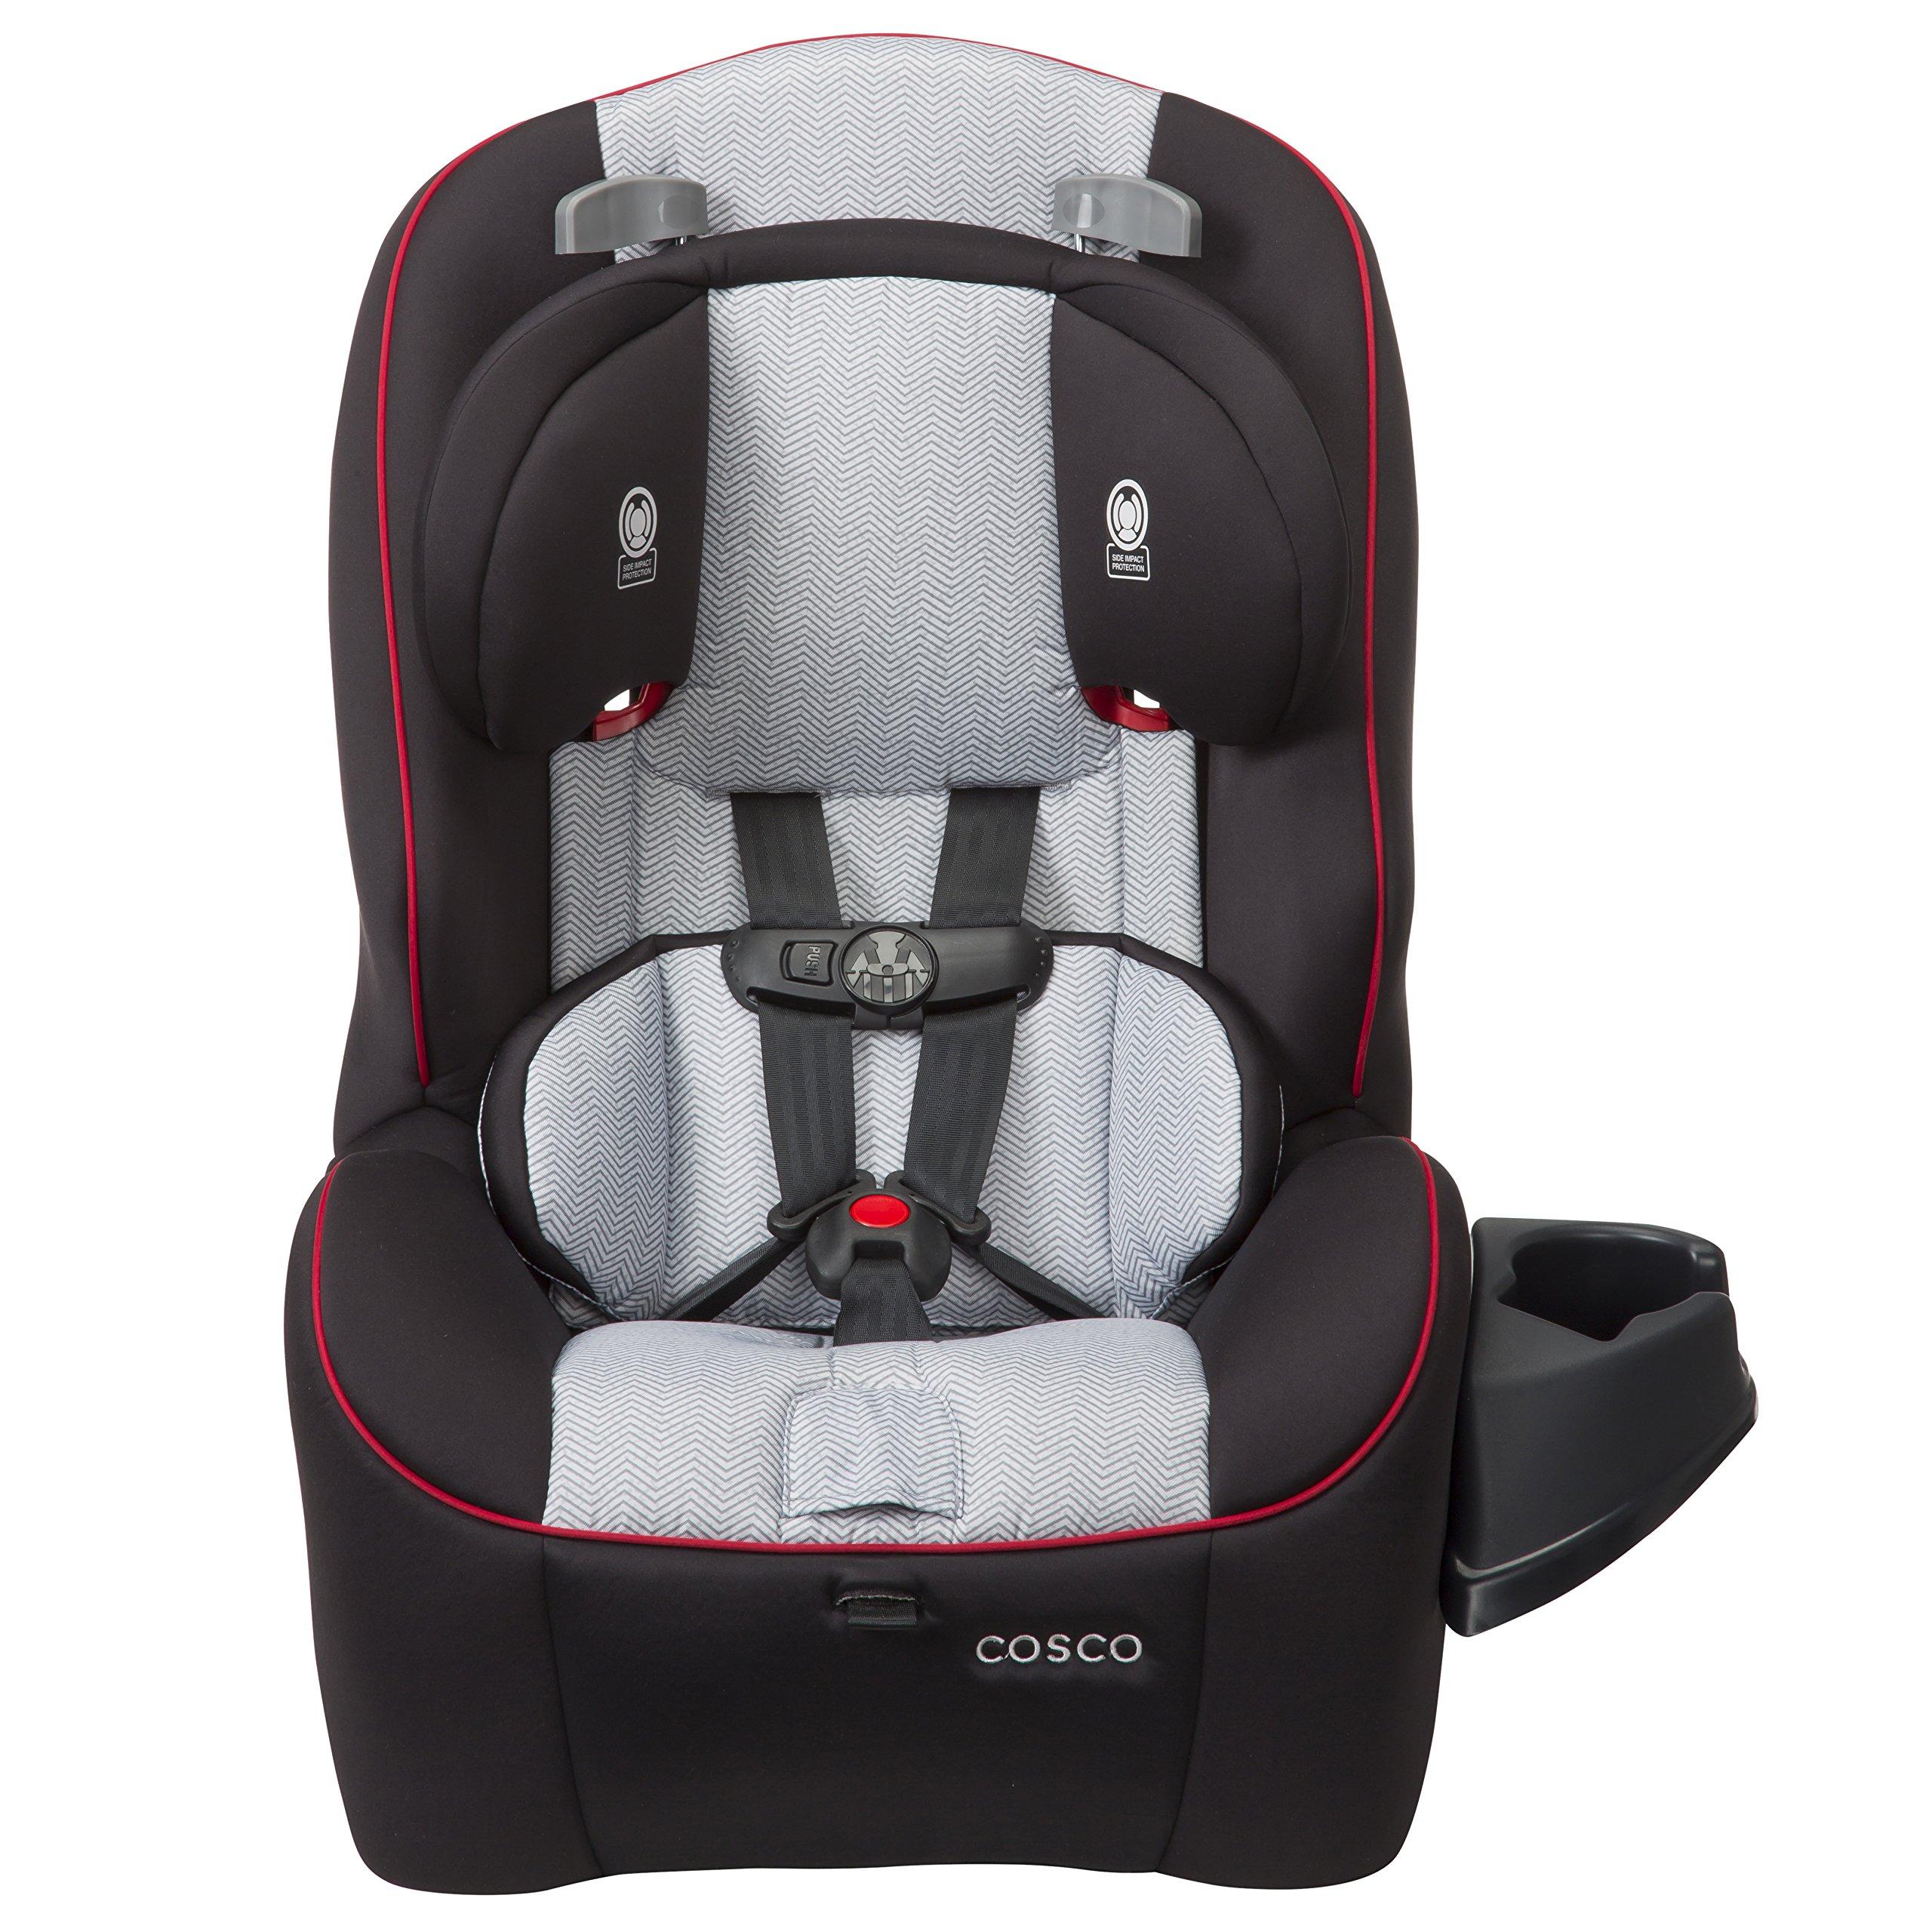 Cosco Easy Elite 3-in-1 Convertible Car Seat, Wallstreet Grey